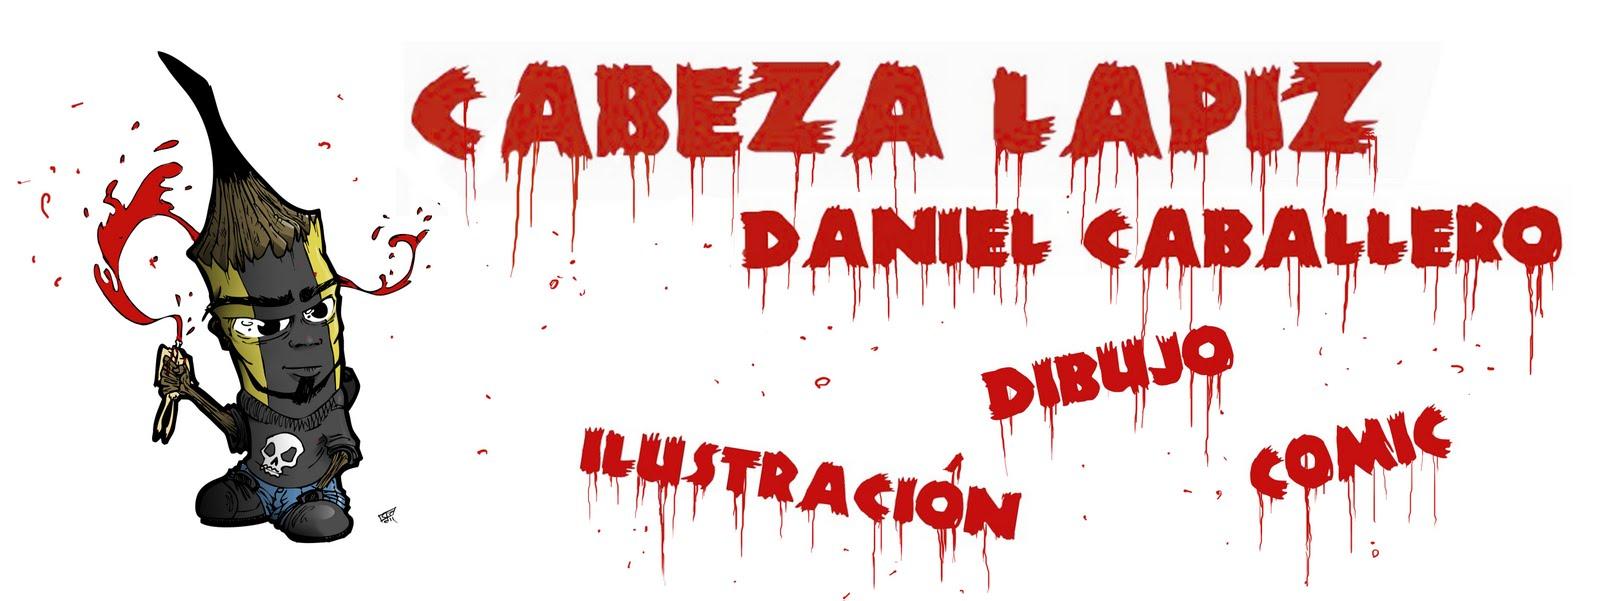 Cabeza Lapiz Ilustracion Dibujo Comic